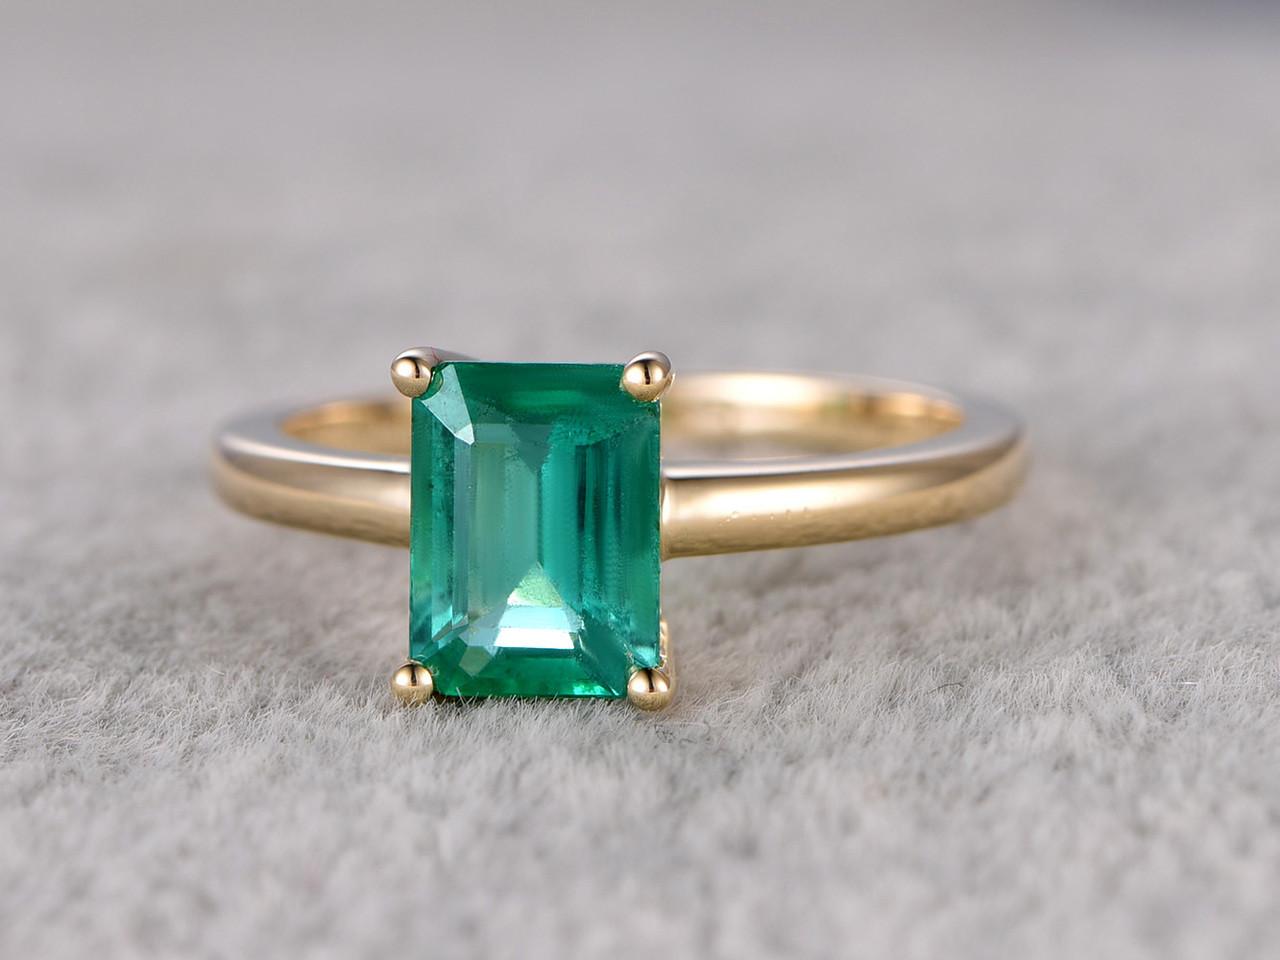 6x8mm Emerald Cut Natural Emerald Engagement Ring 14k